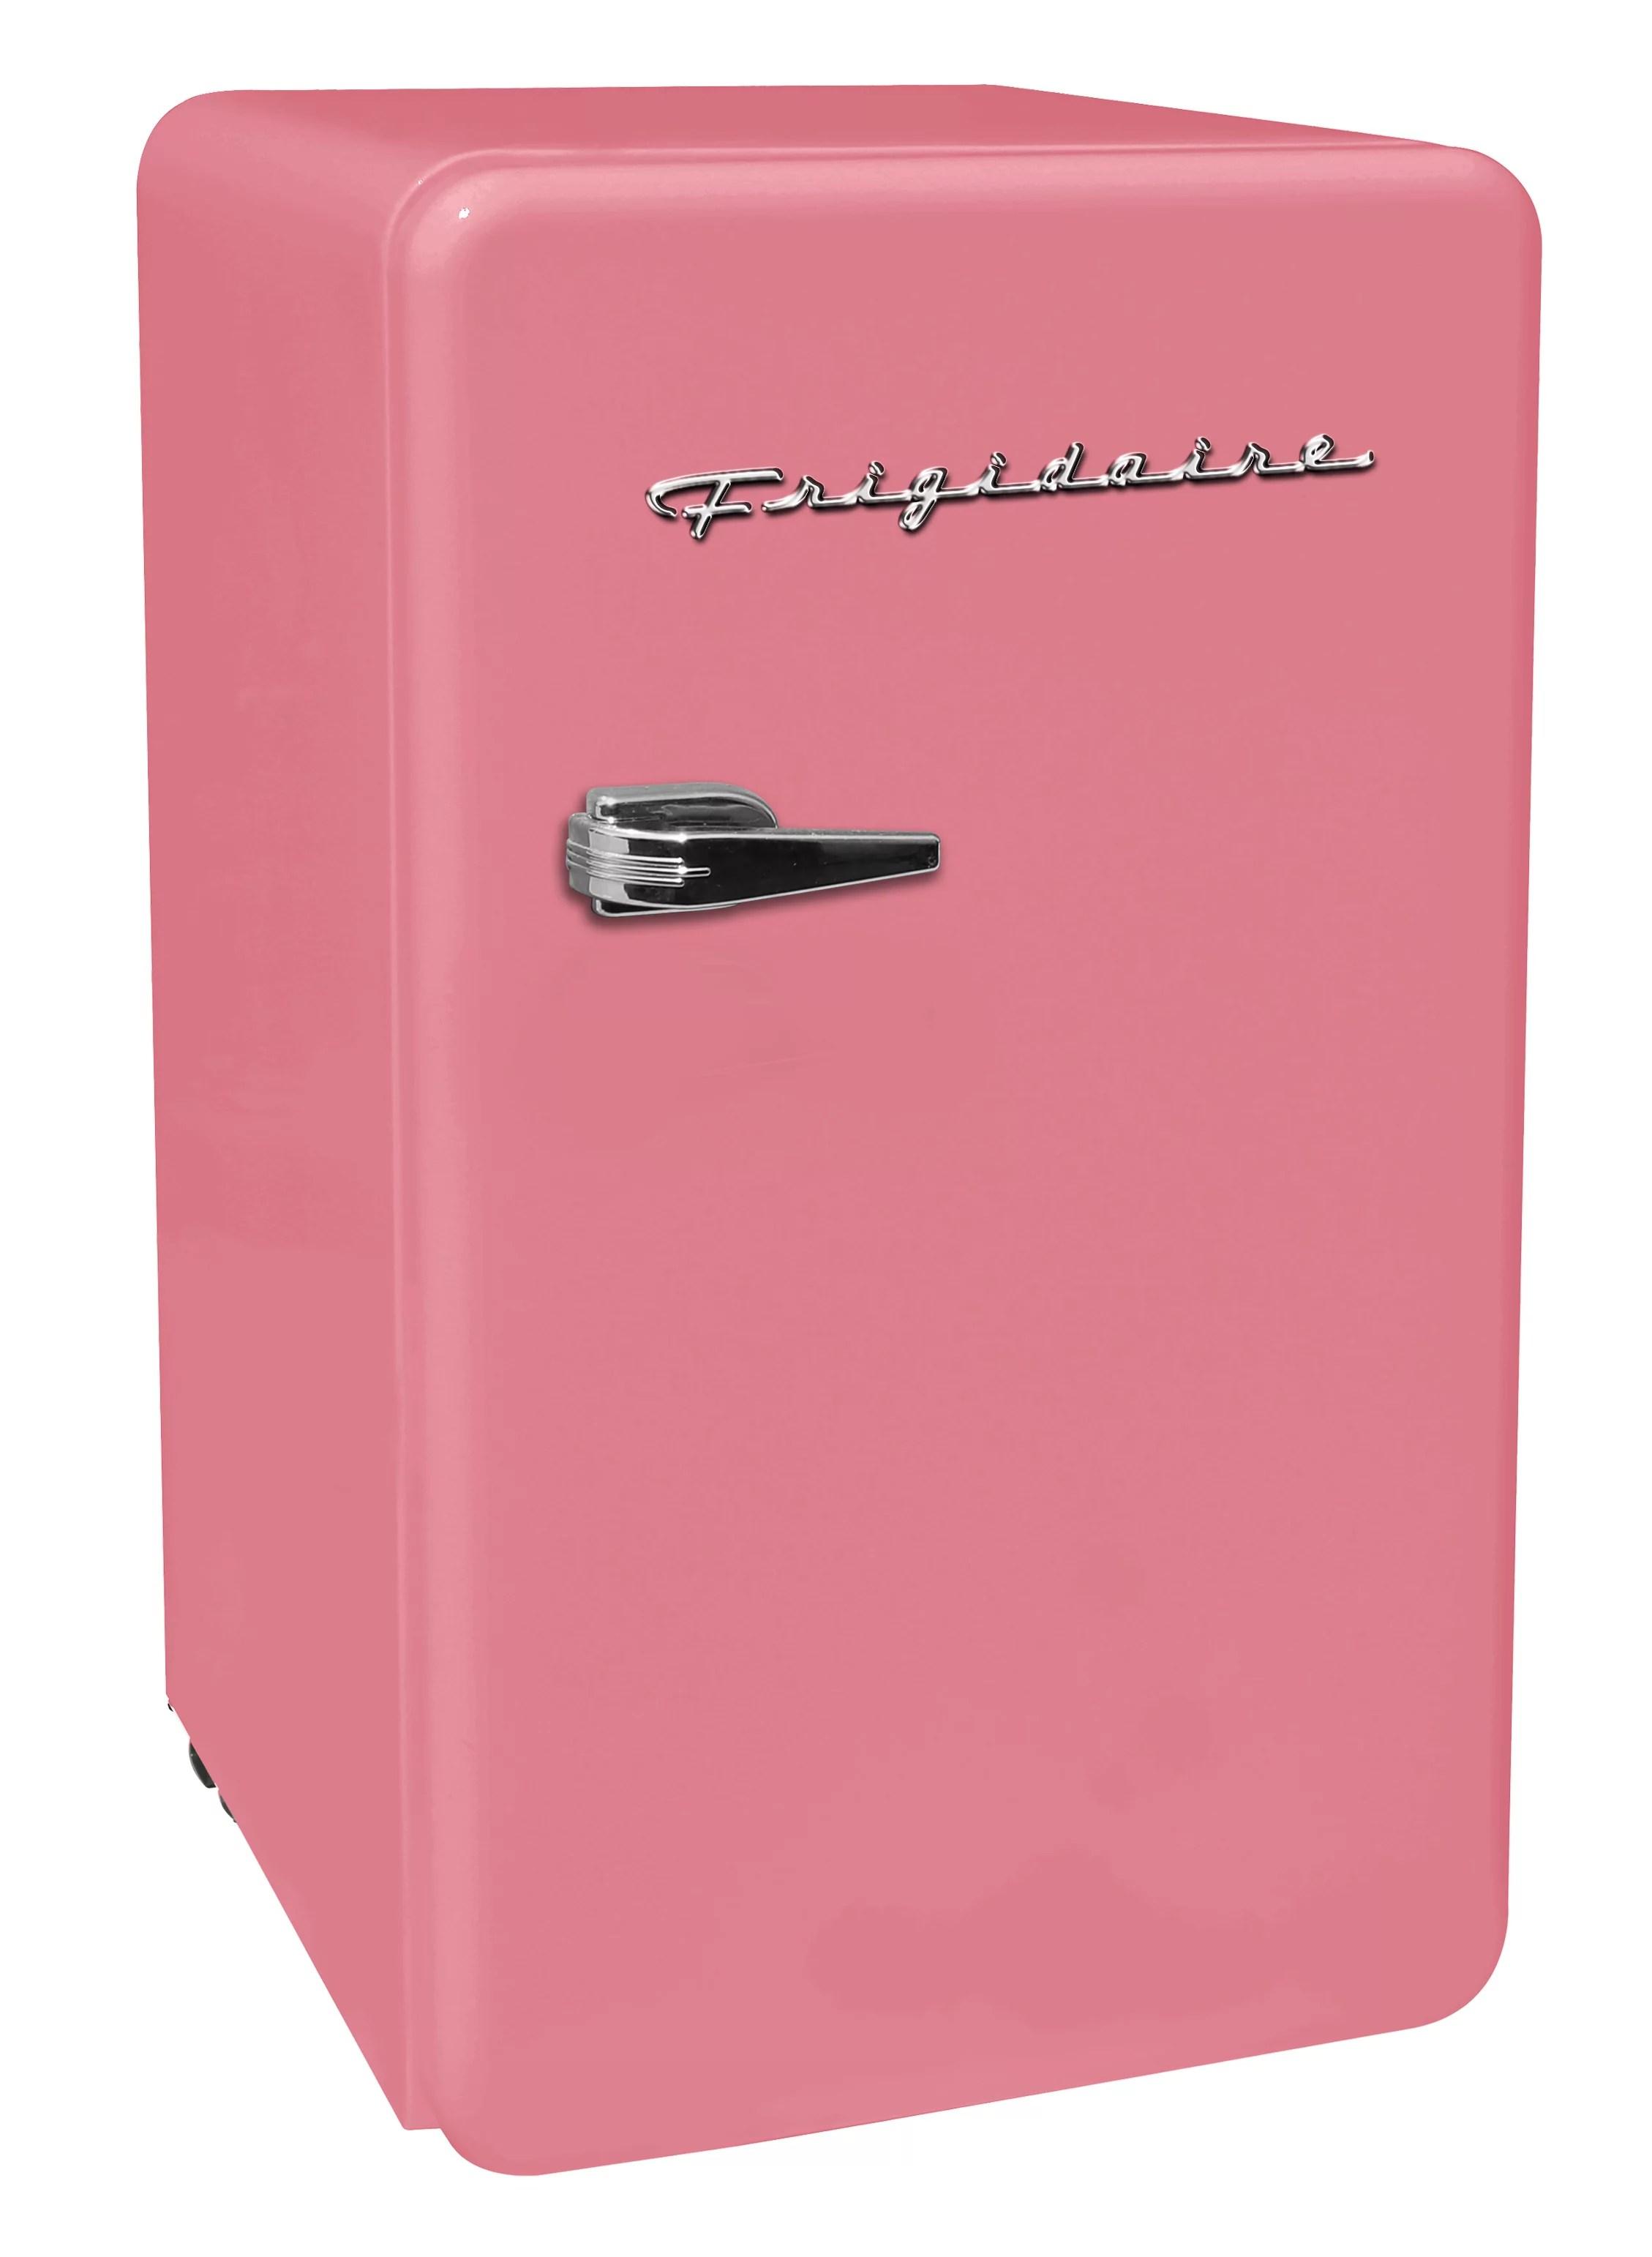 frigidaire 3 2 cu ft single door retro compact fridge efr372 pink walmart com